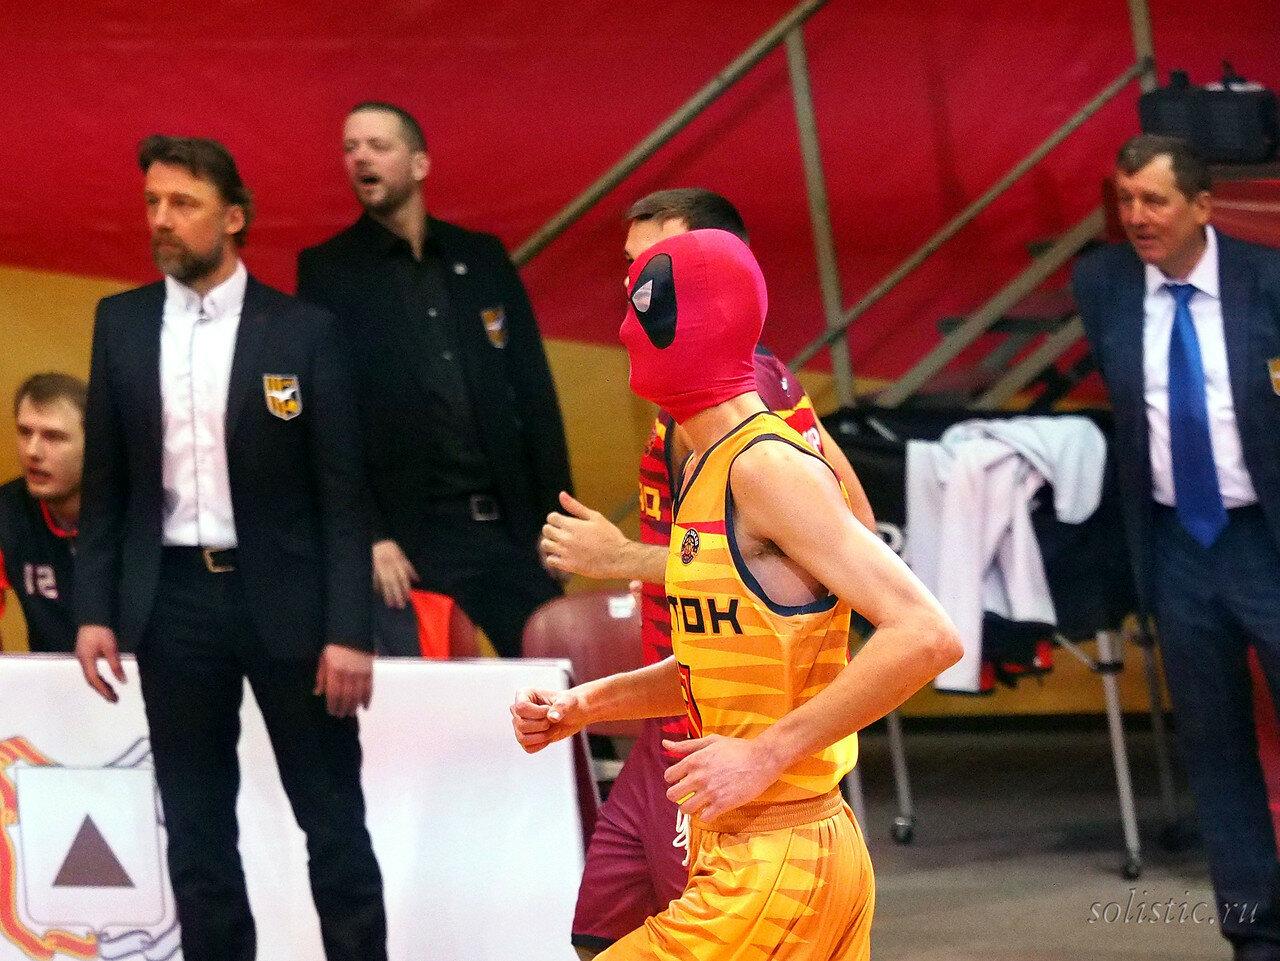 84 Матч звезд АСБ 2018 (ассоциации студенческого баскетбола)